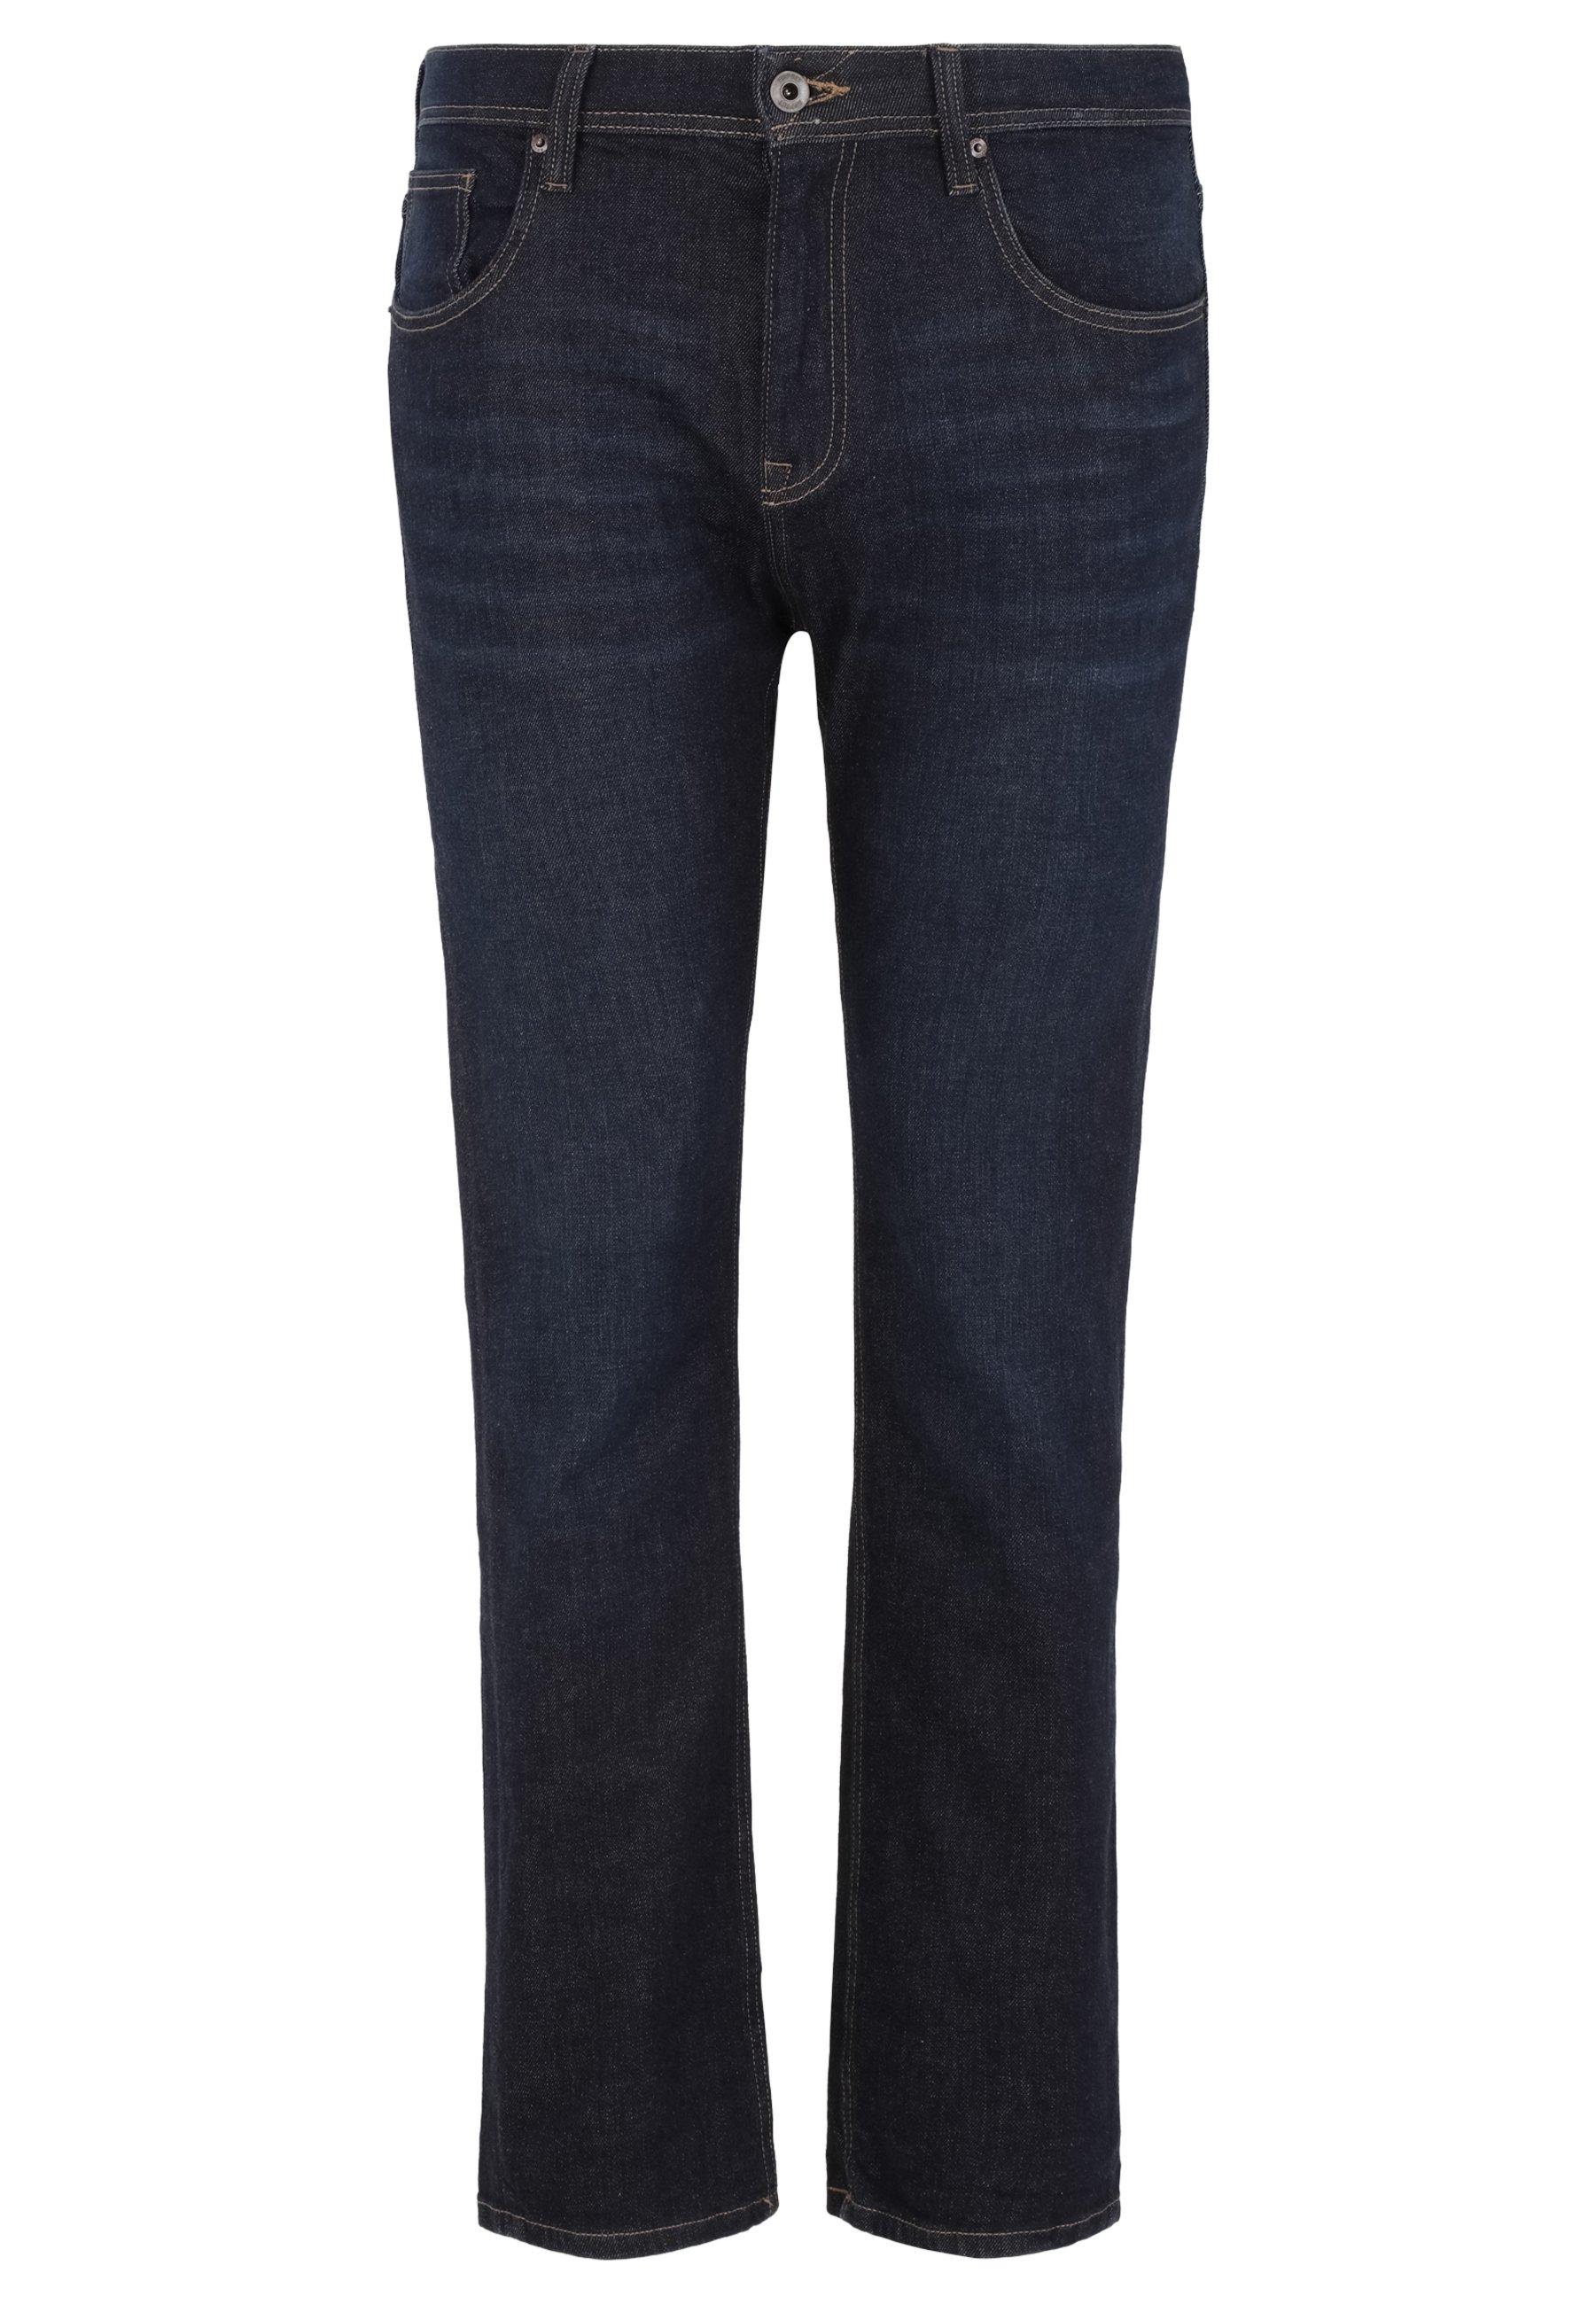 Uomo Jeans a sigaretta - dark blue